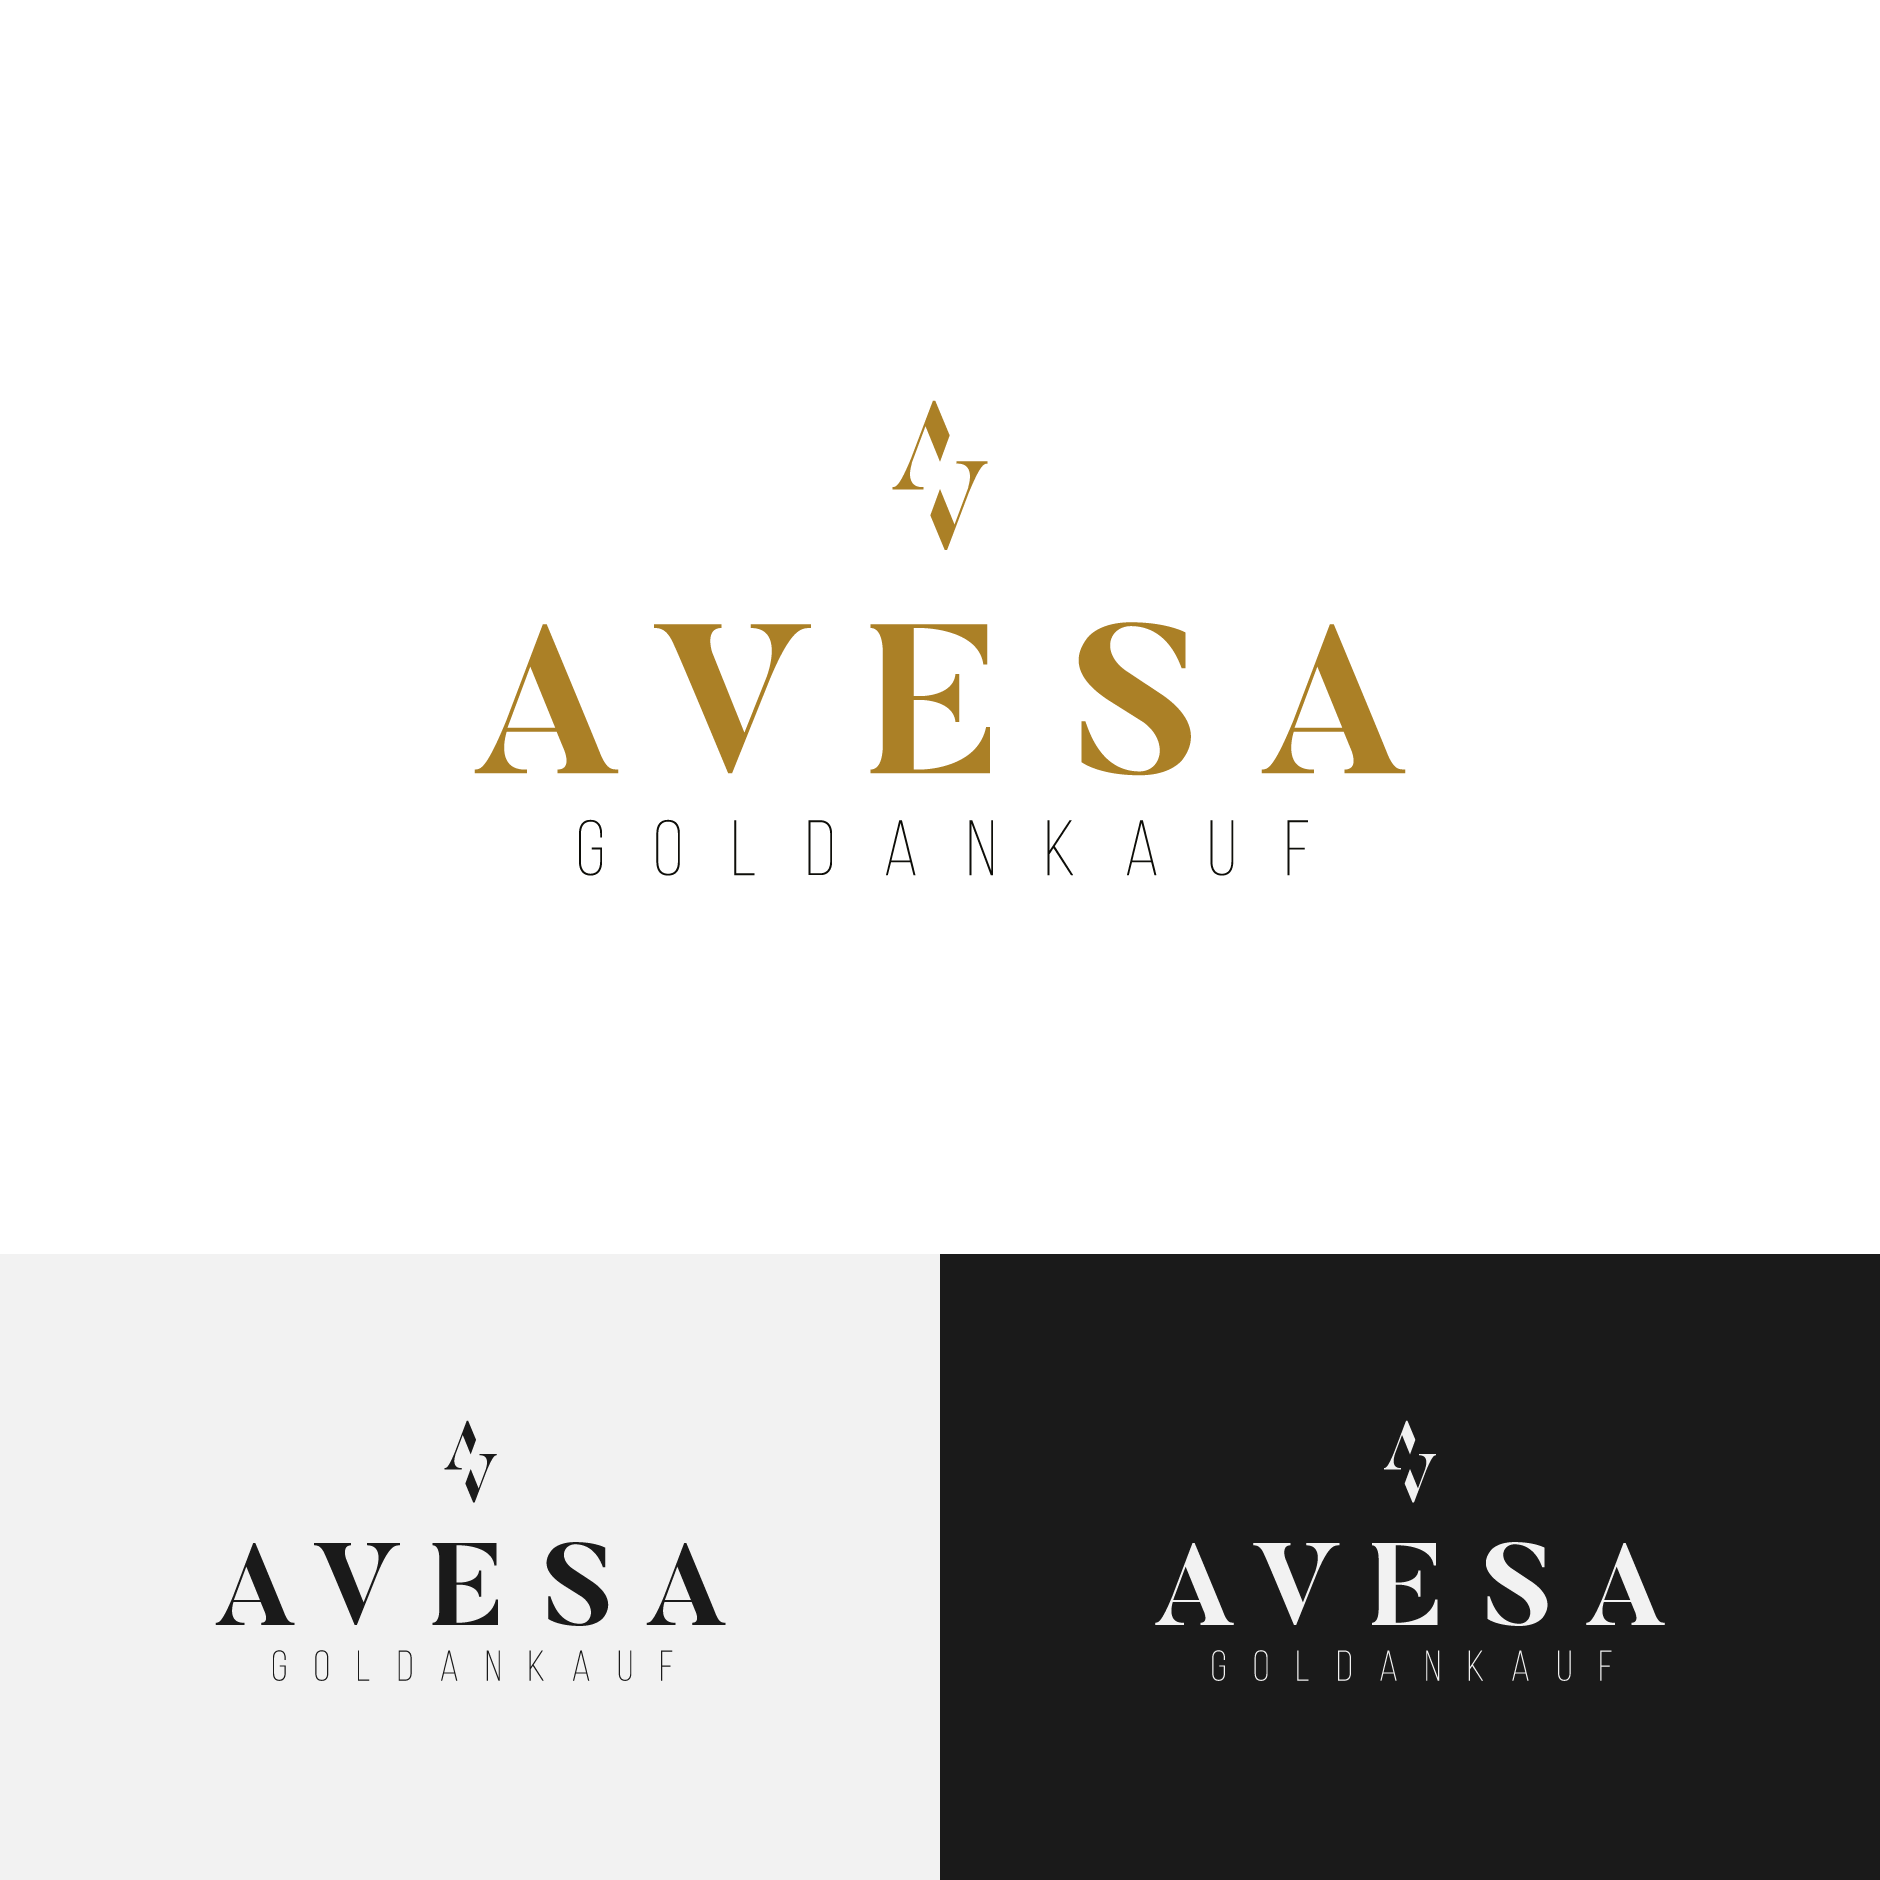 AVESA logodesign 1880x1880-Logodesign AVESA Goldankauf